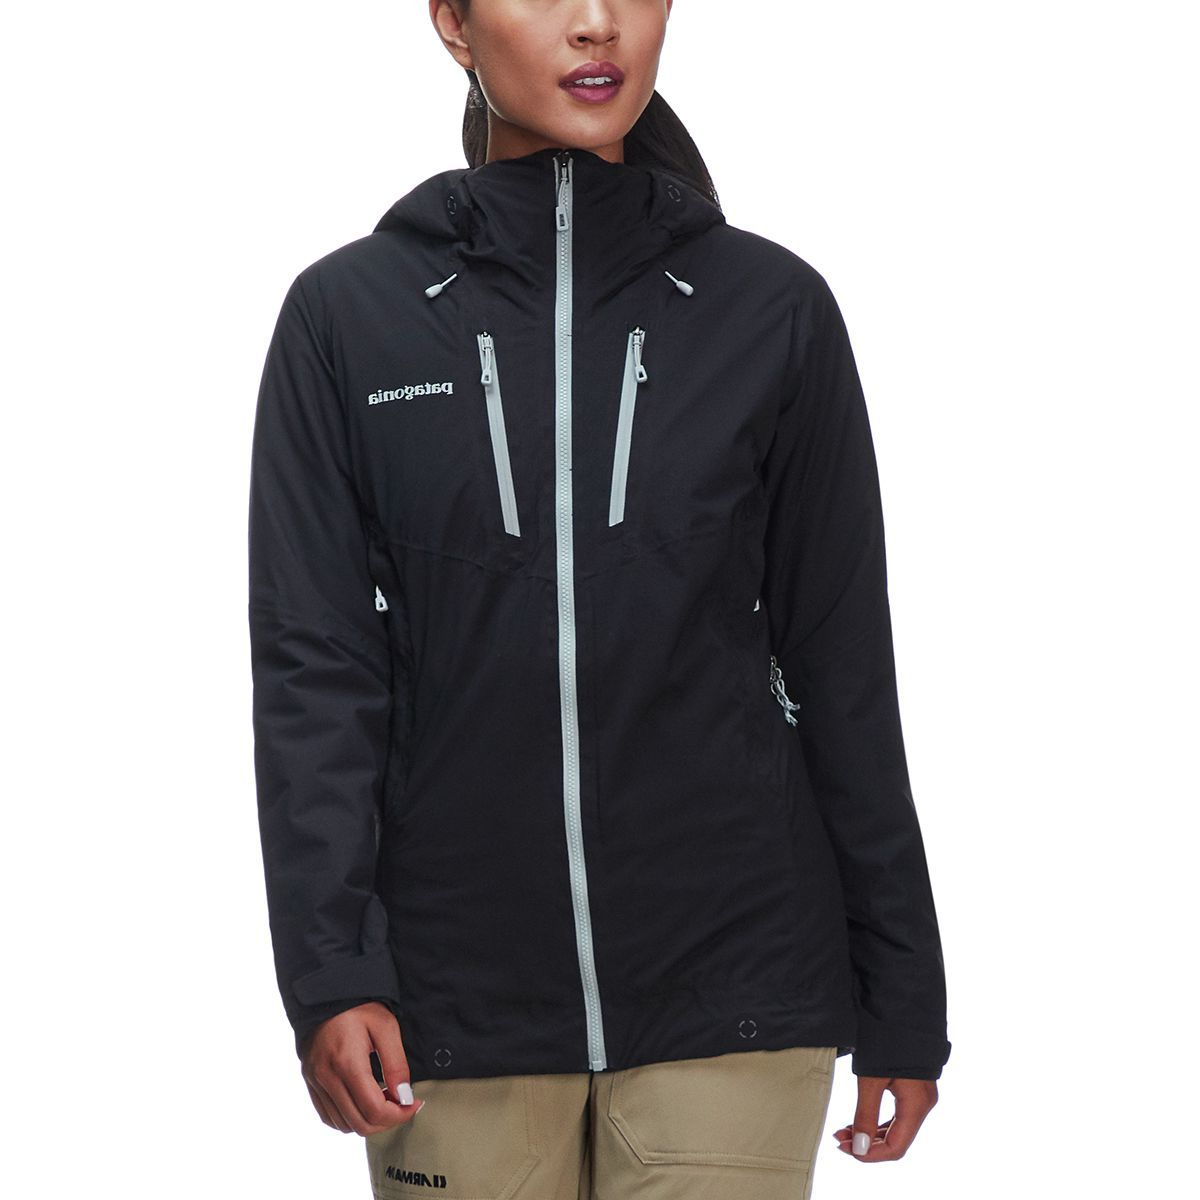 Patagonia Stretch Nano Storm Jacket - Women's